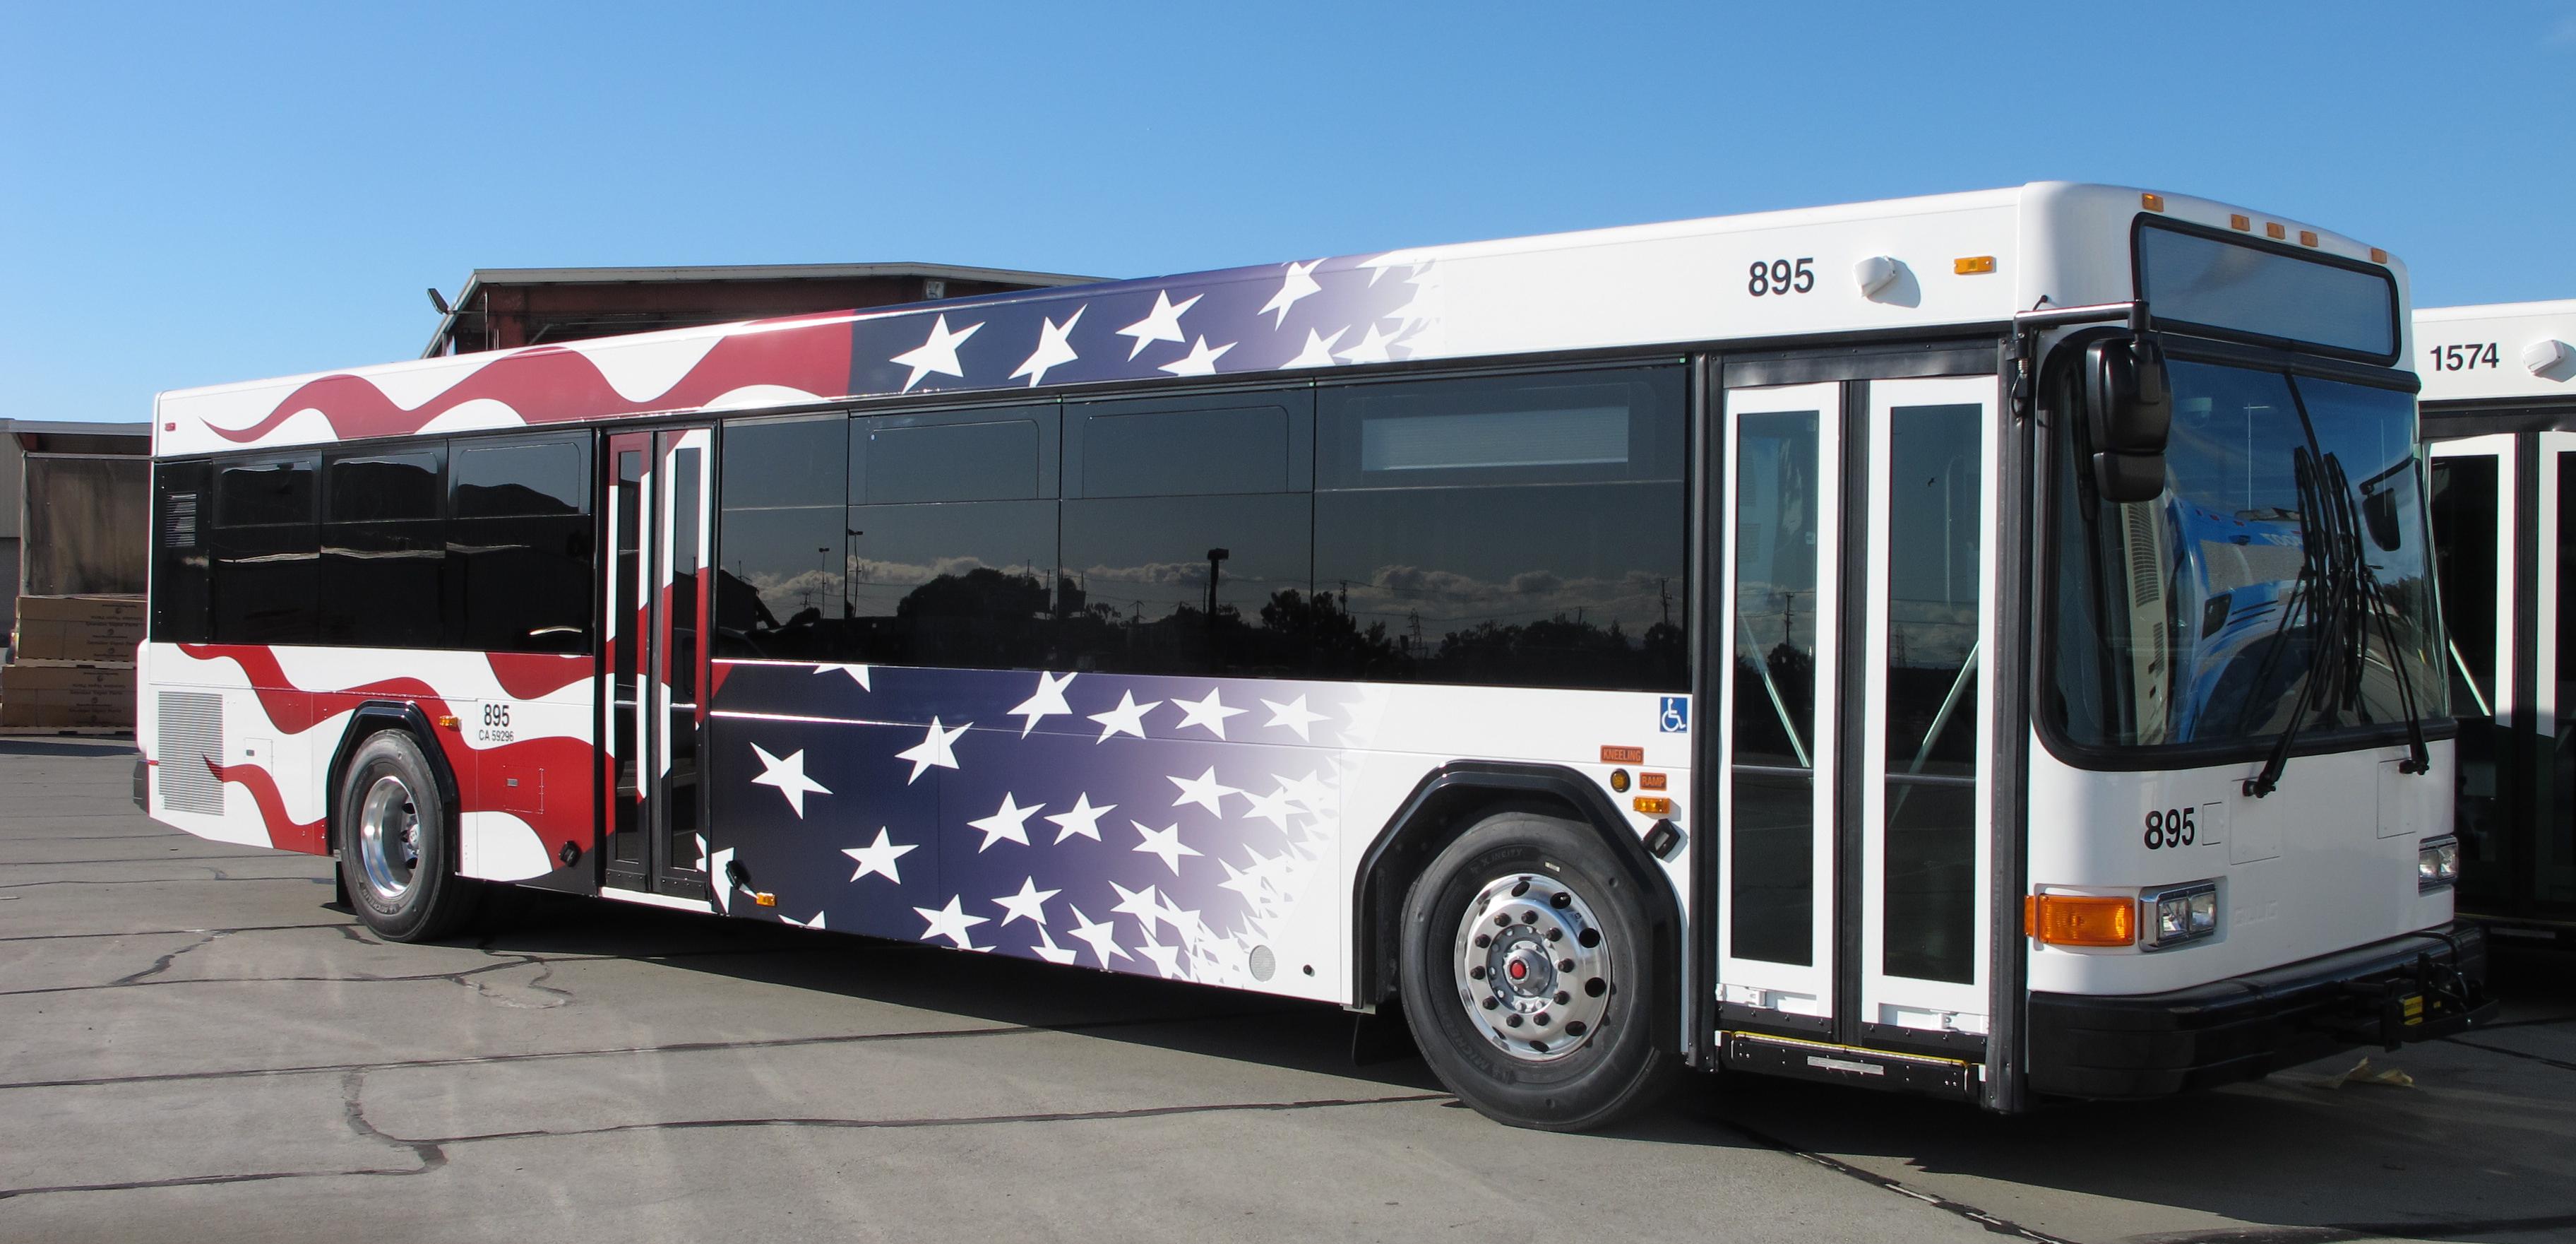 ACRTA 2017 bus